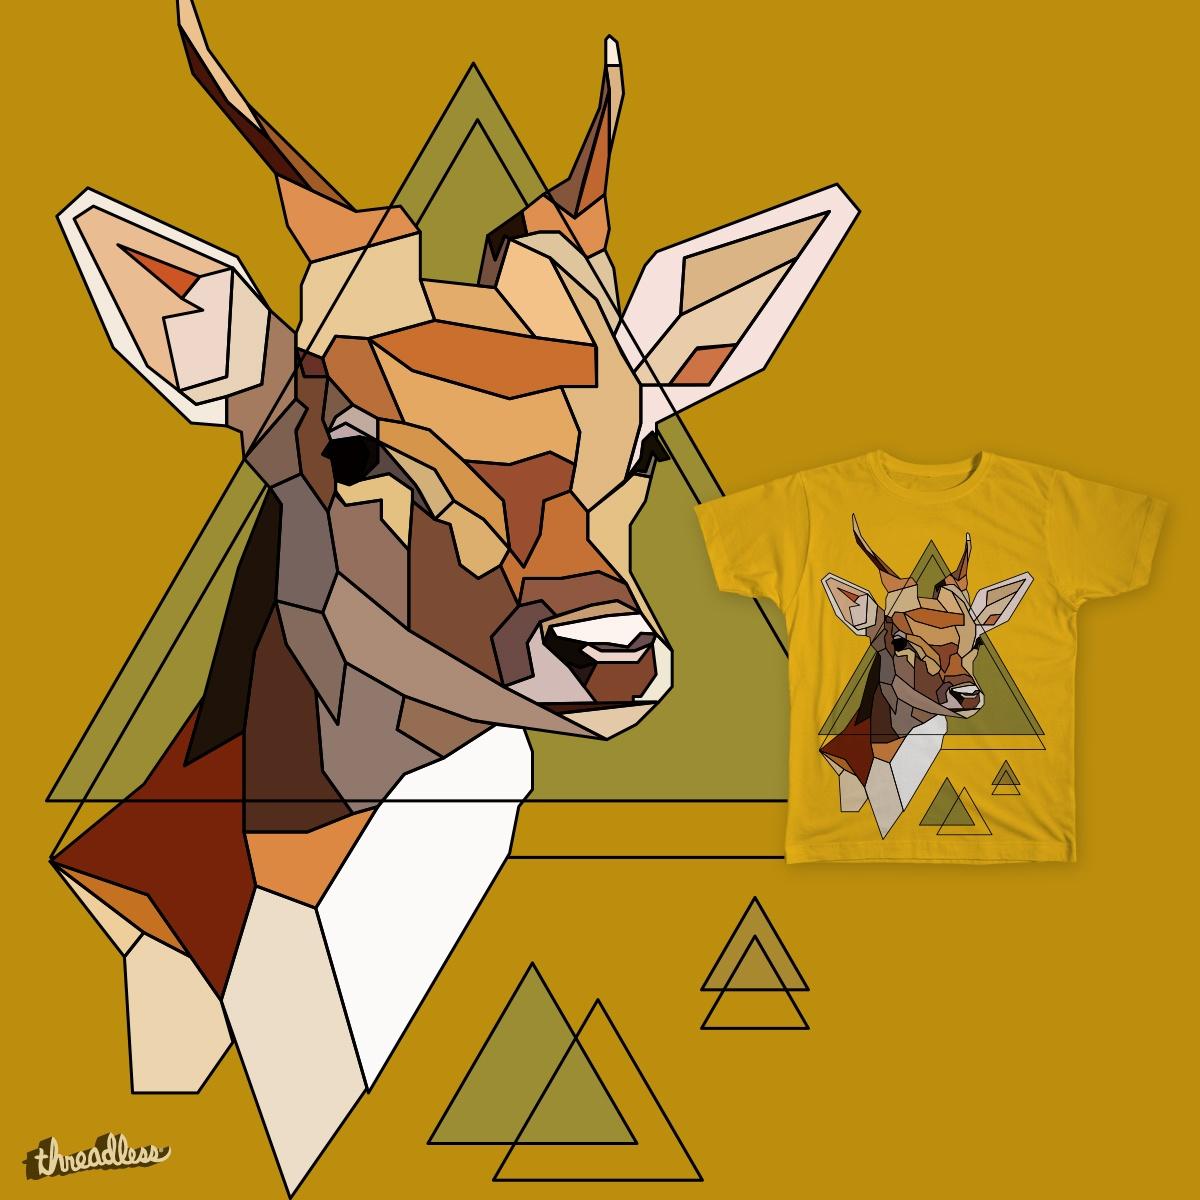 Deer Hunt by sknny on Threadless